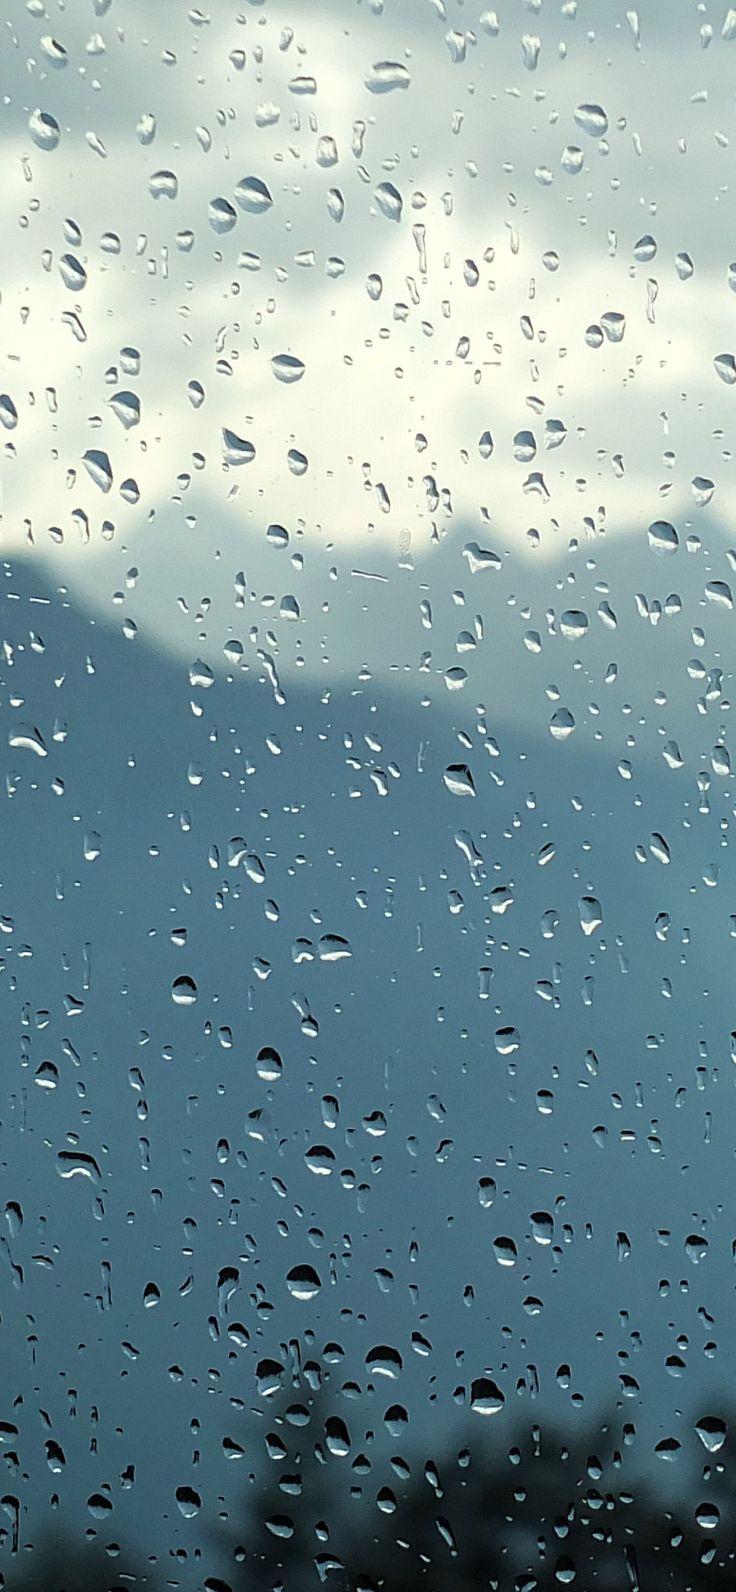 нижнем дождь картинки фото на телефон снимку легких можно